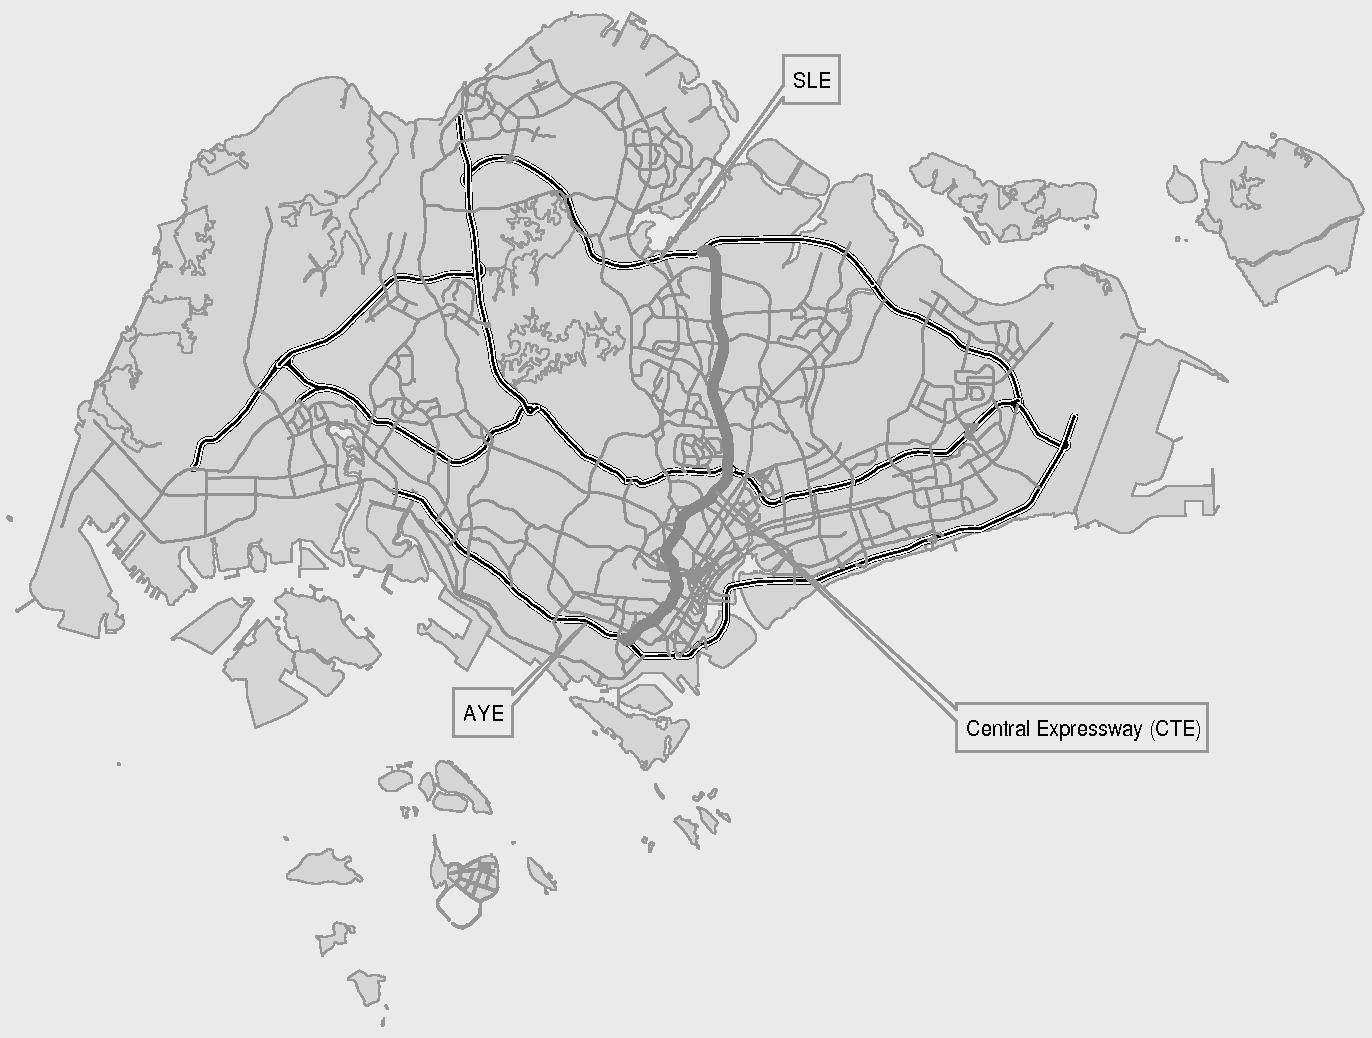 FIGURE 3 Overview of Singapore road network (SLE = Seletar Expressway; AYE = Ayer Rajah Expressway).